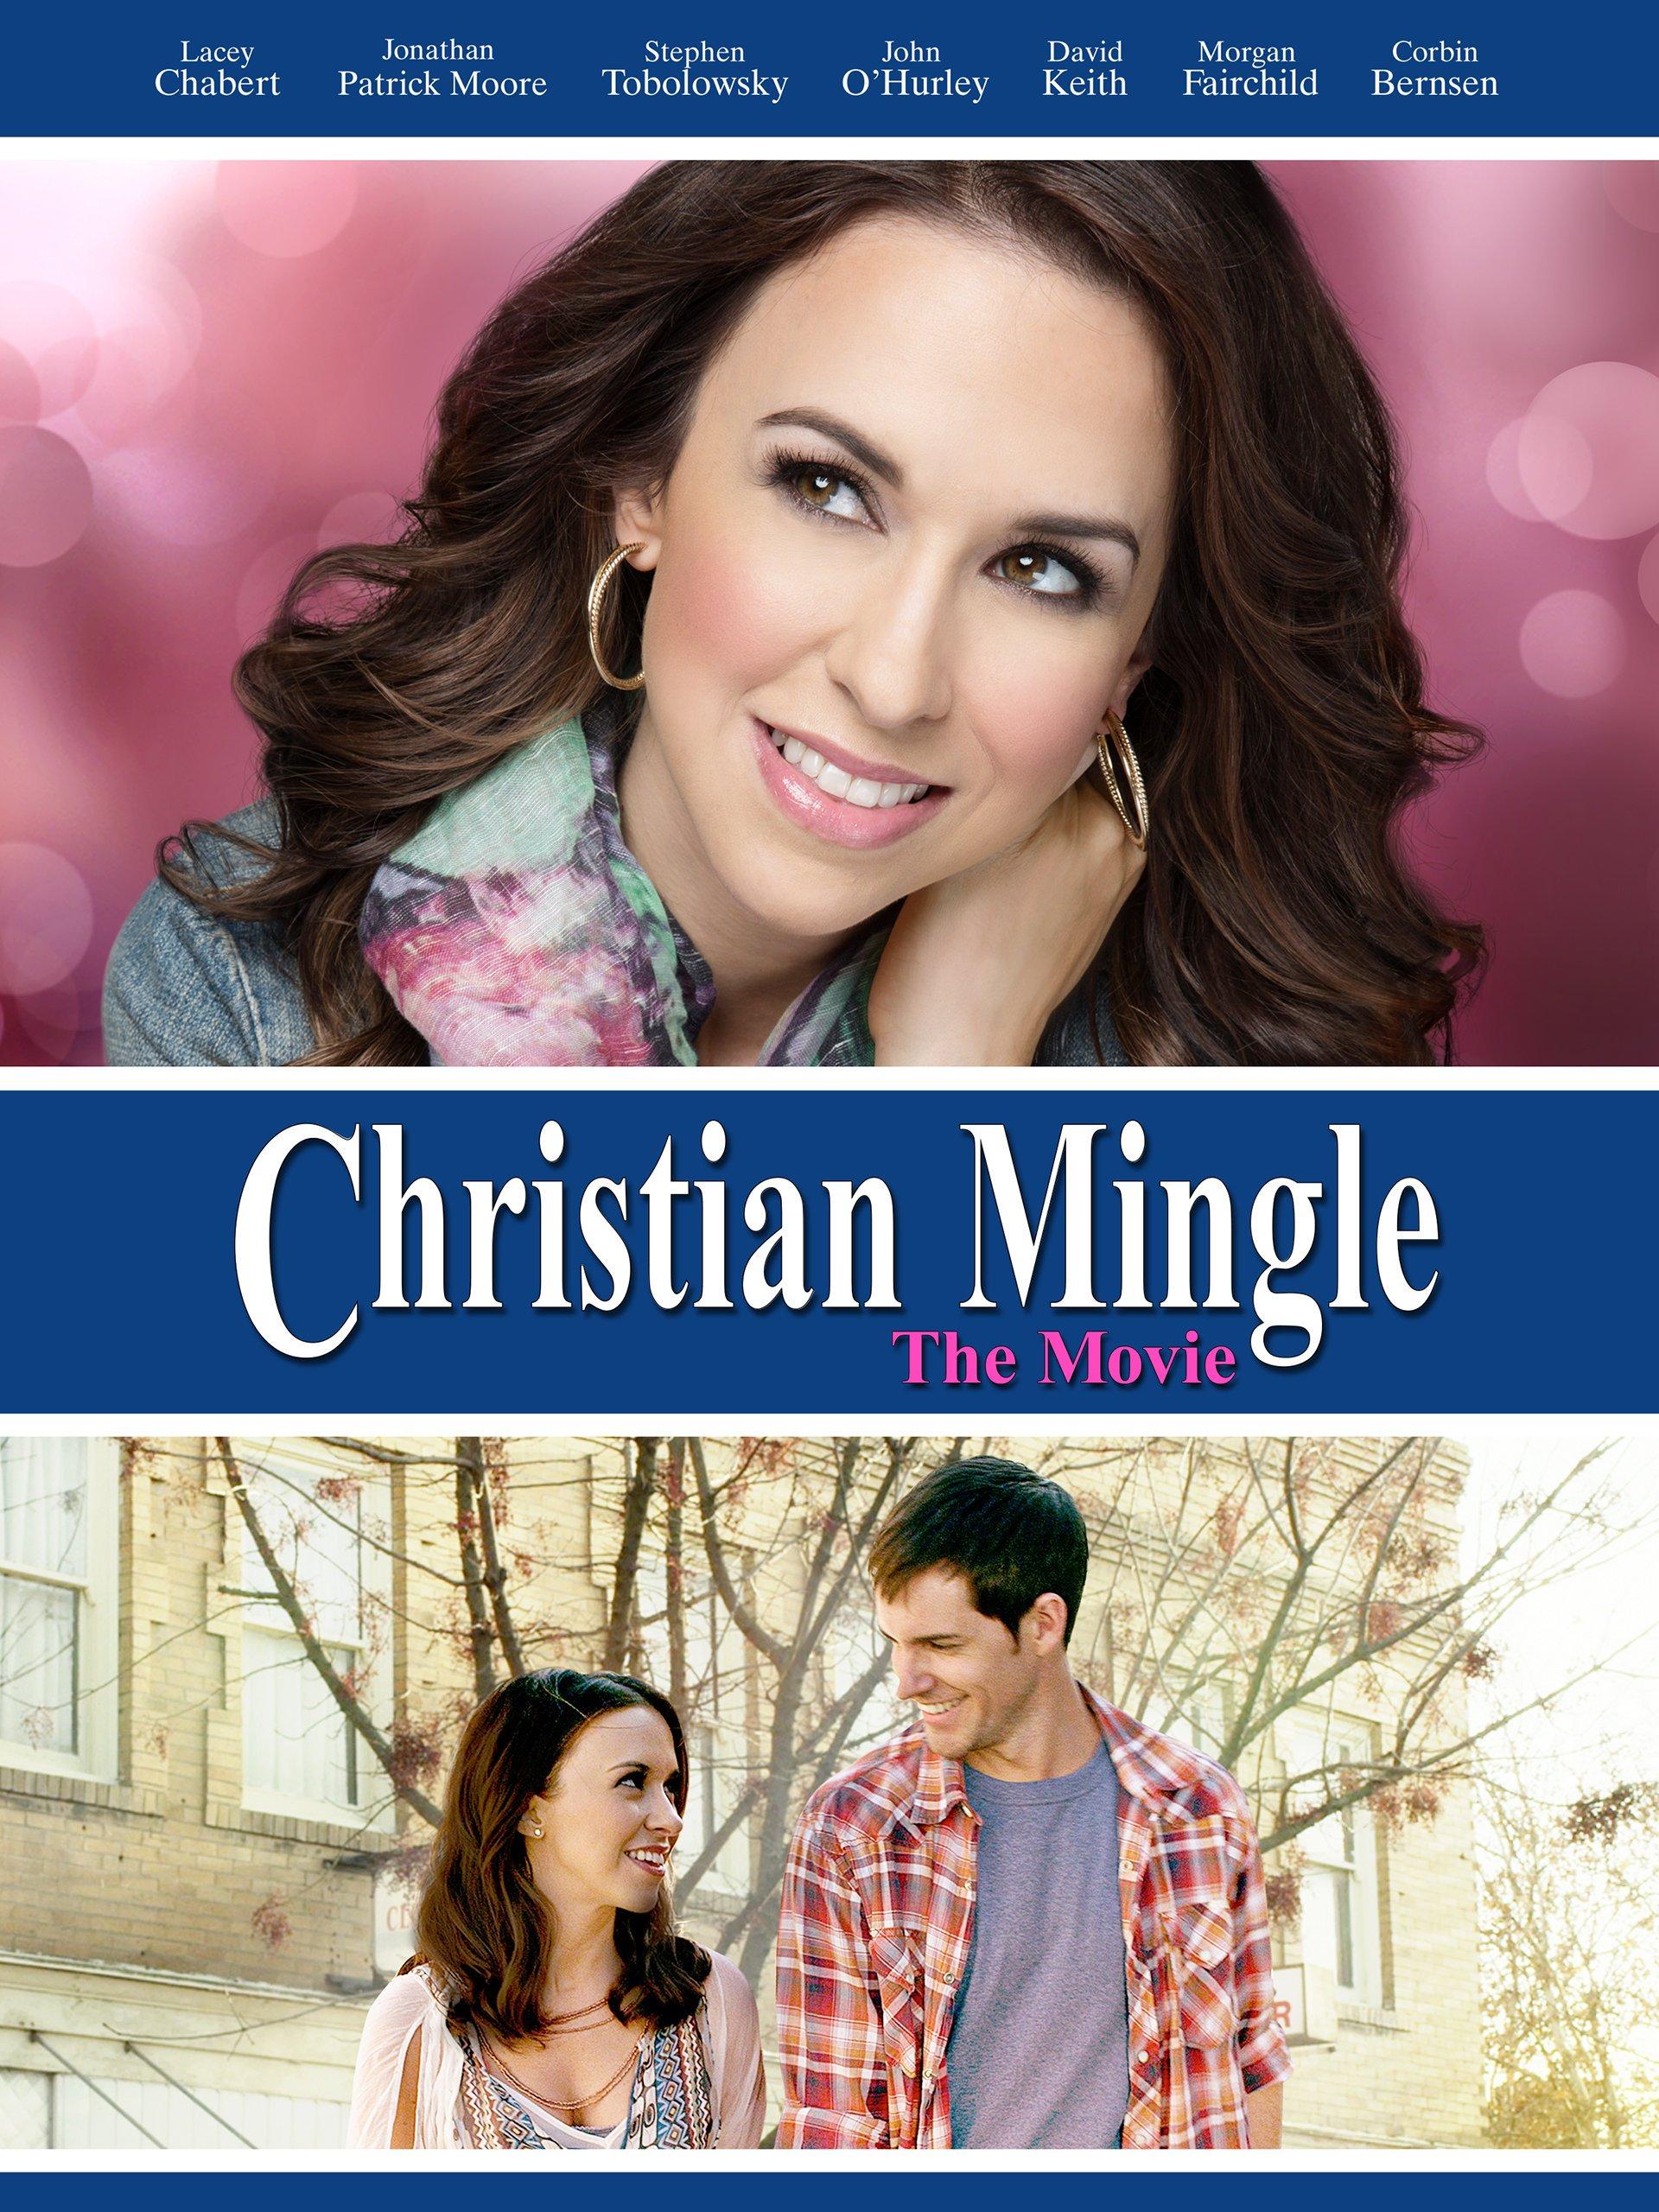 Christian mingle free trial code